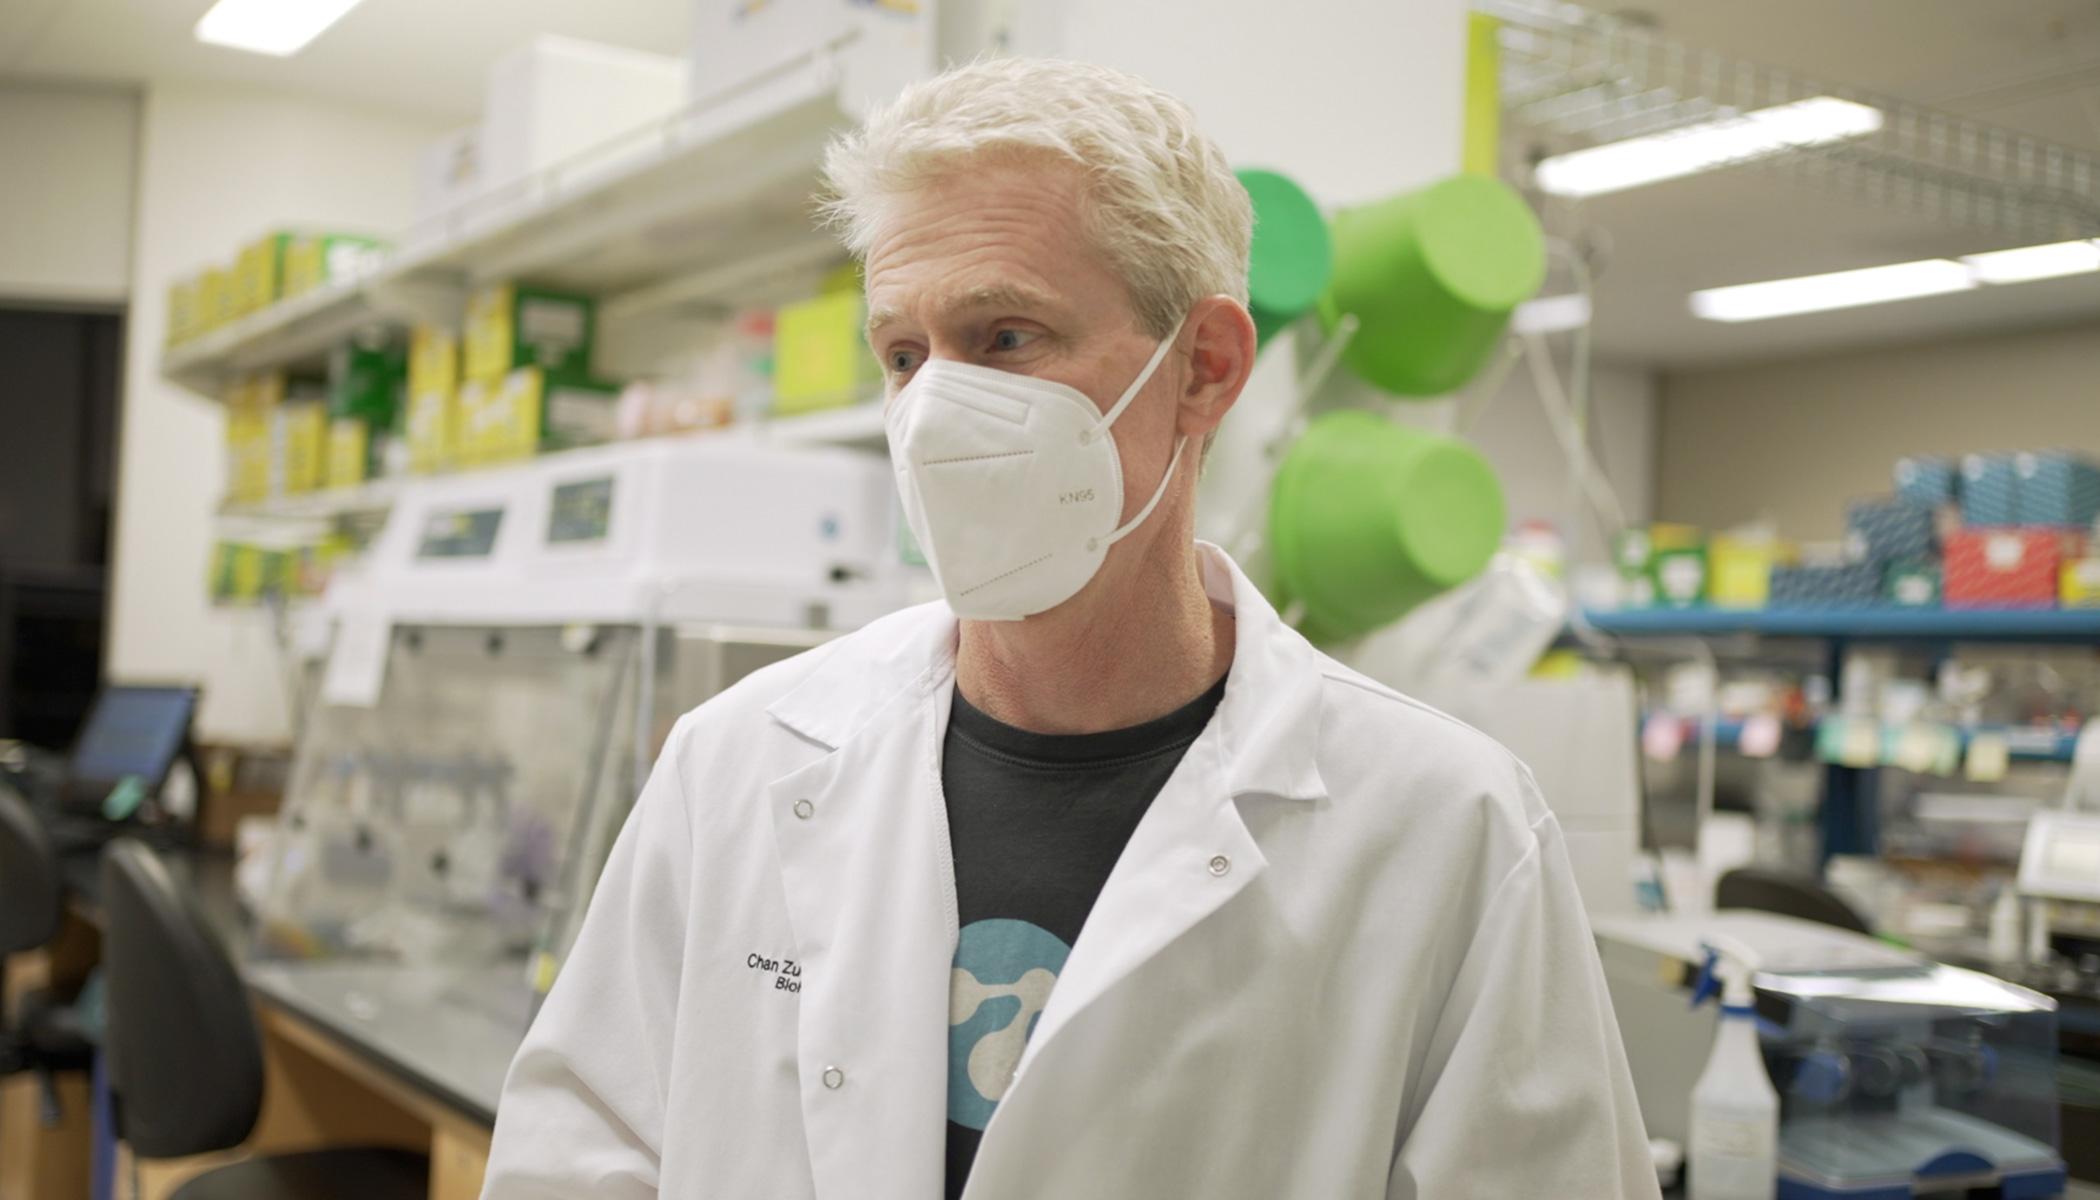 Joe DeRisi in white lab coat wears a N-95 mask in a COVID-19 lab.